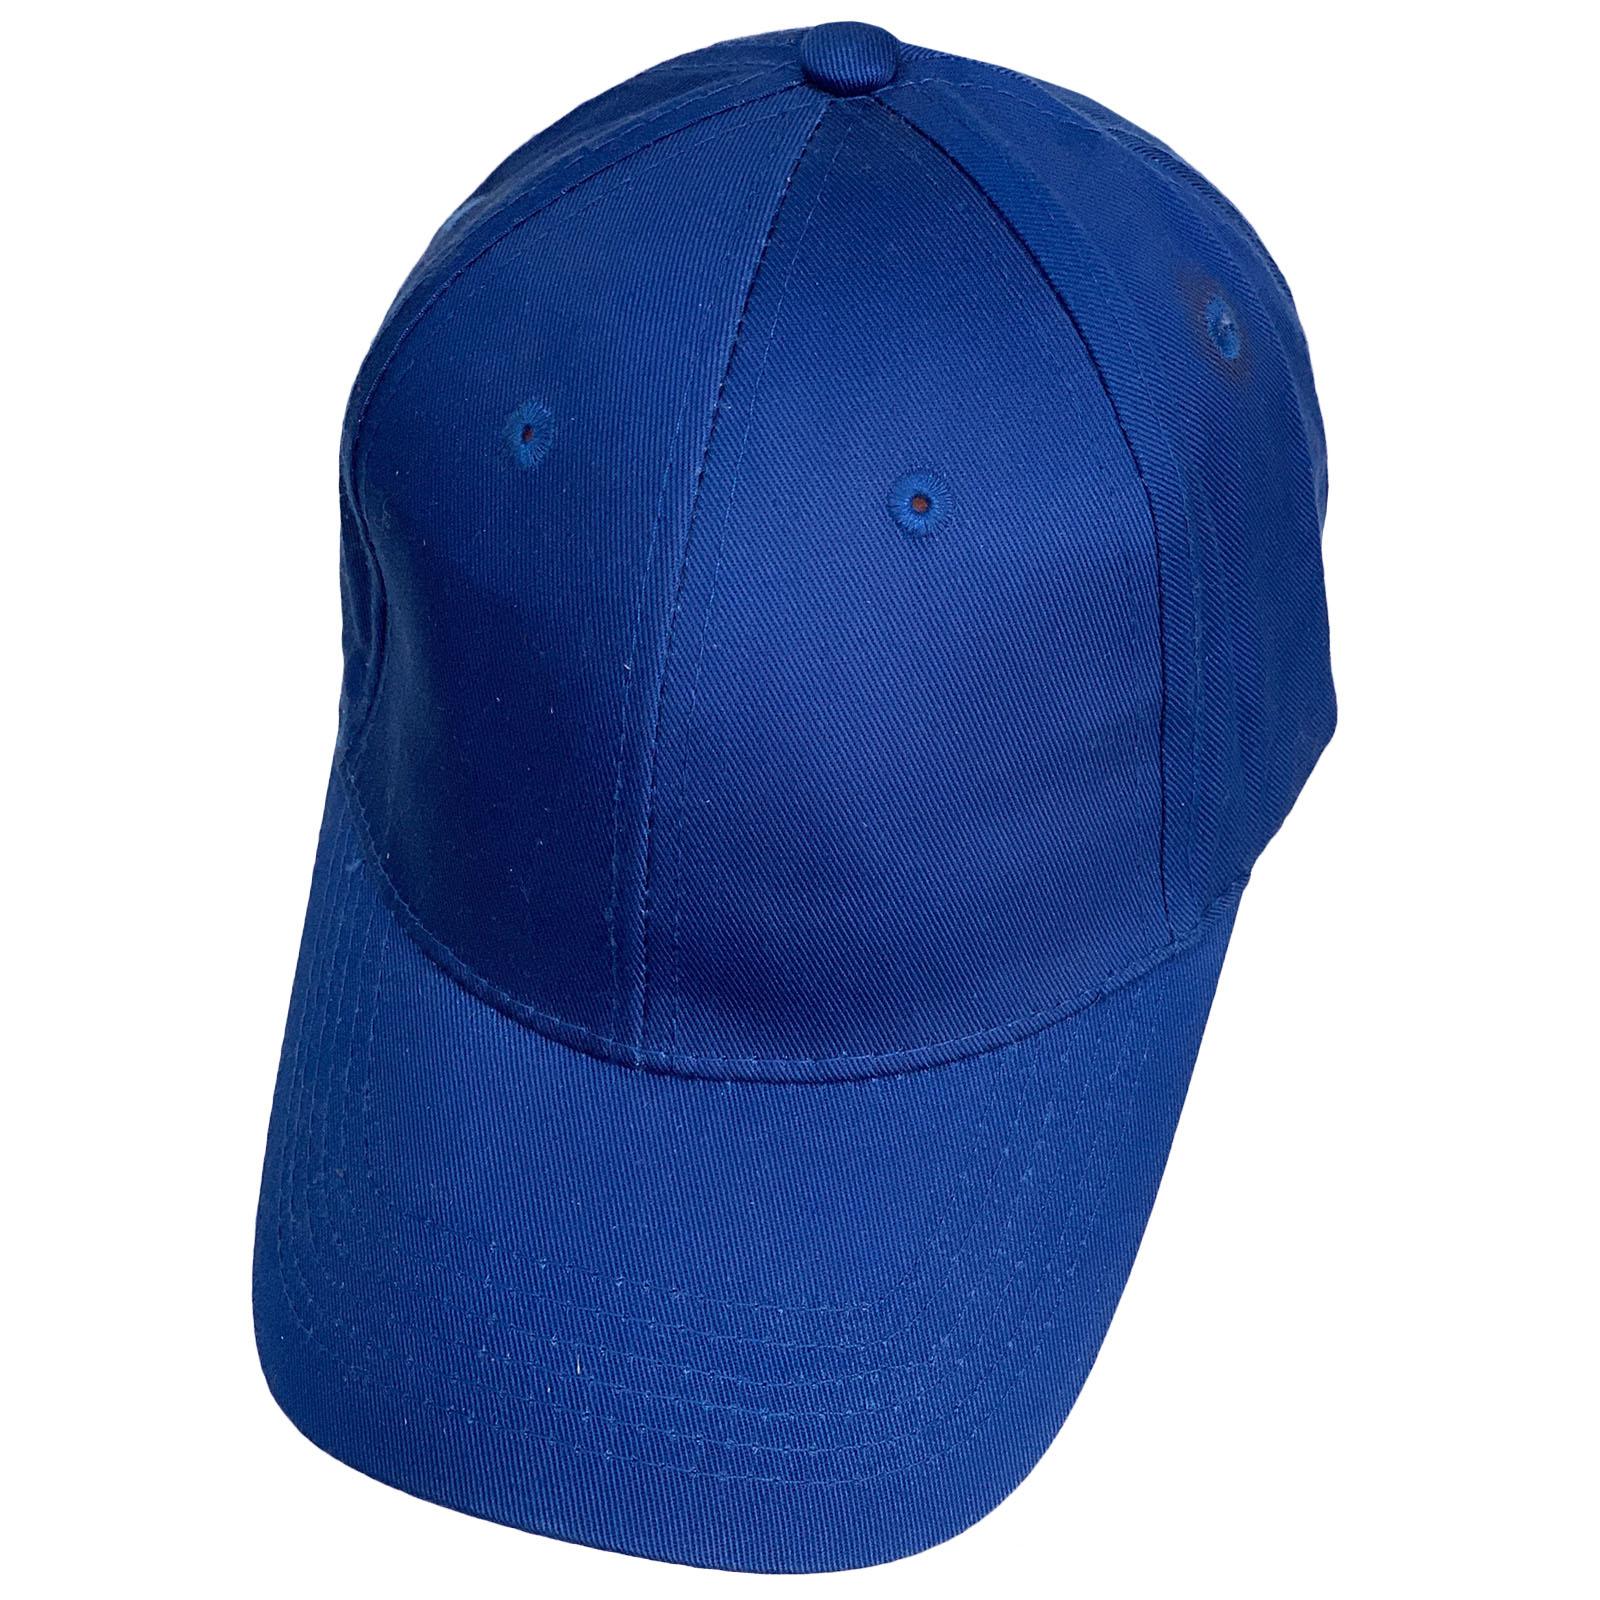 Синяя бейсболка под нанесение логотипа